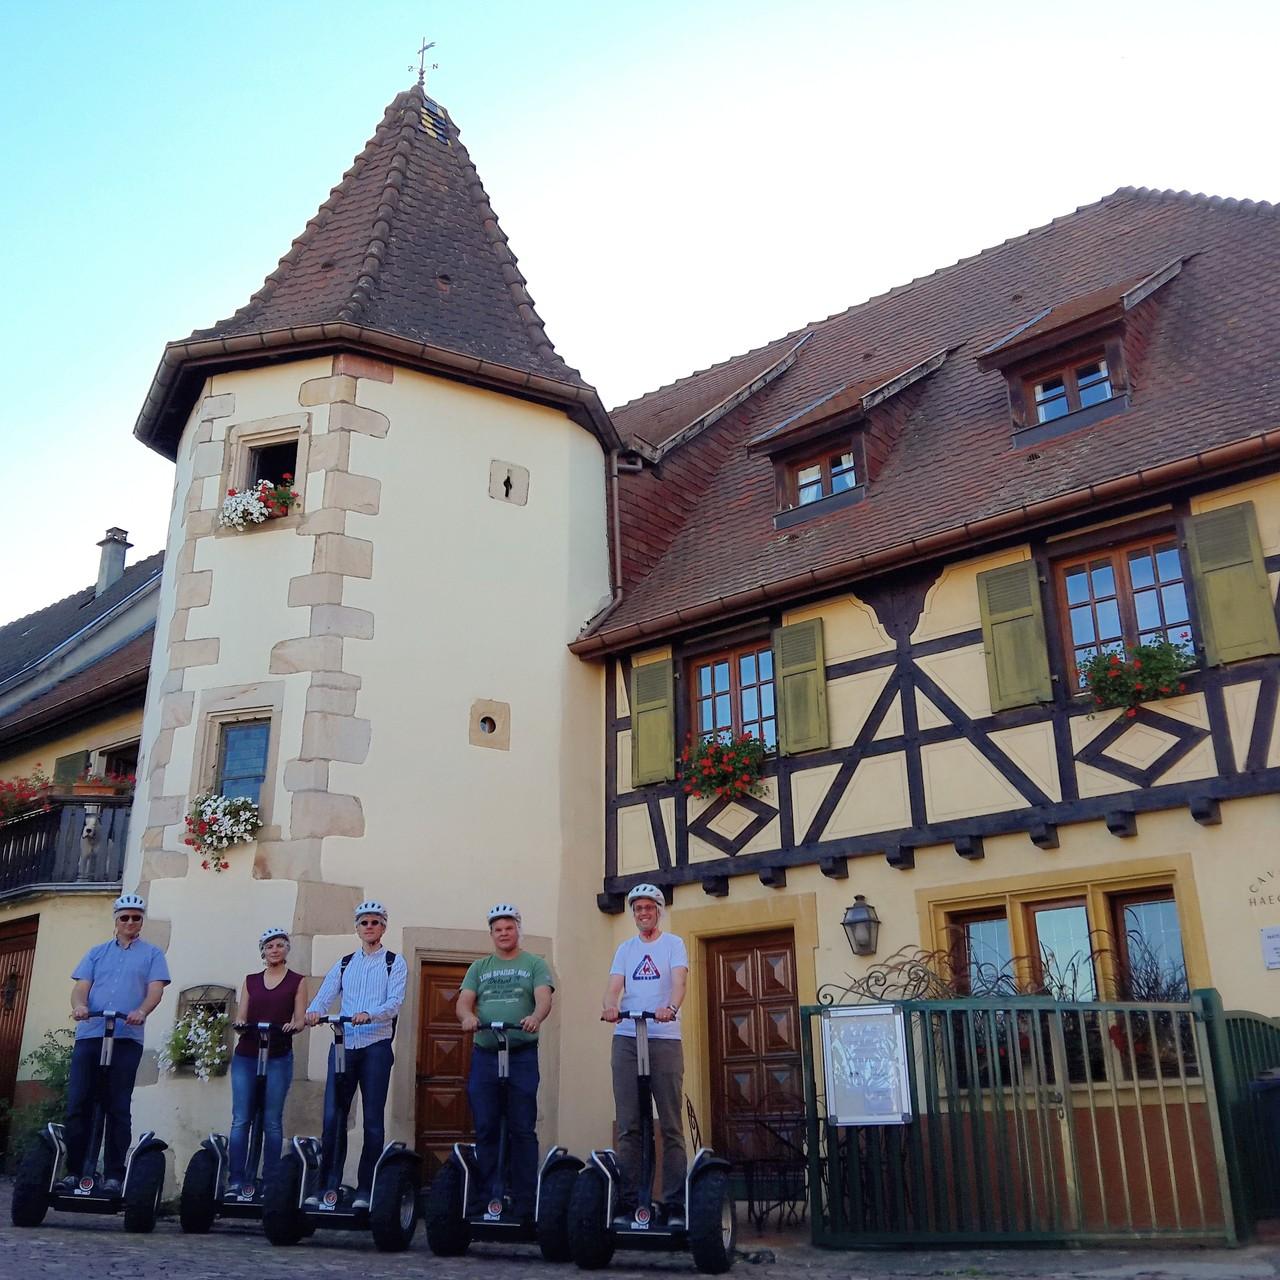 FUN MOVING GYROPODE SEGWAY EN ALSACE - oenotourisme, cave Materne Haegelin et filles, Orschwihr